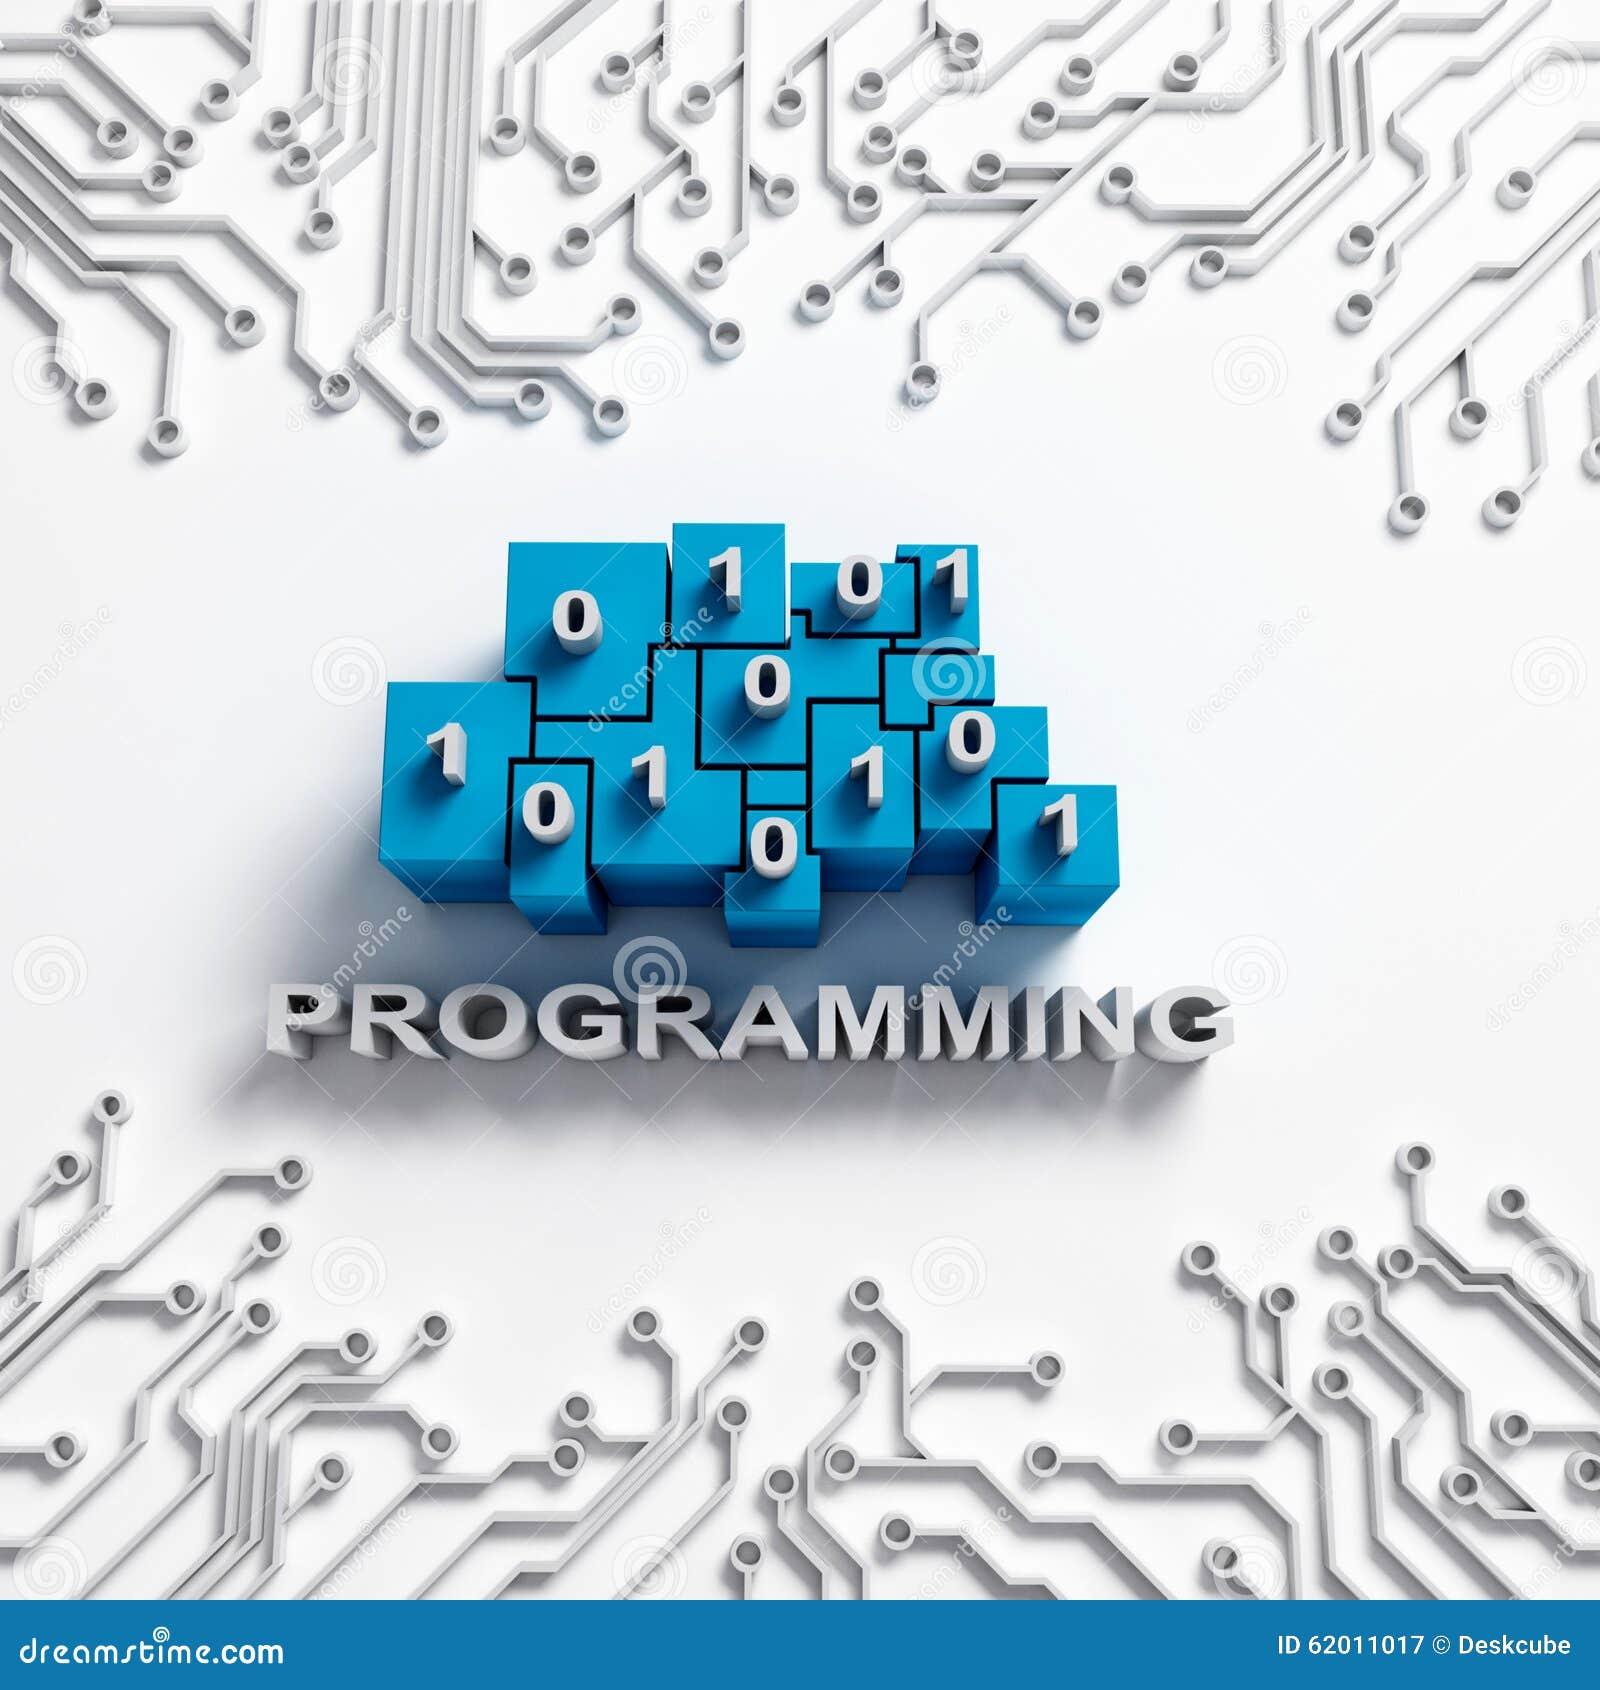 Programming Illustration With Circuits Stock Illustration ...